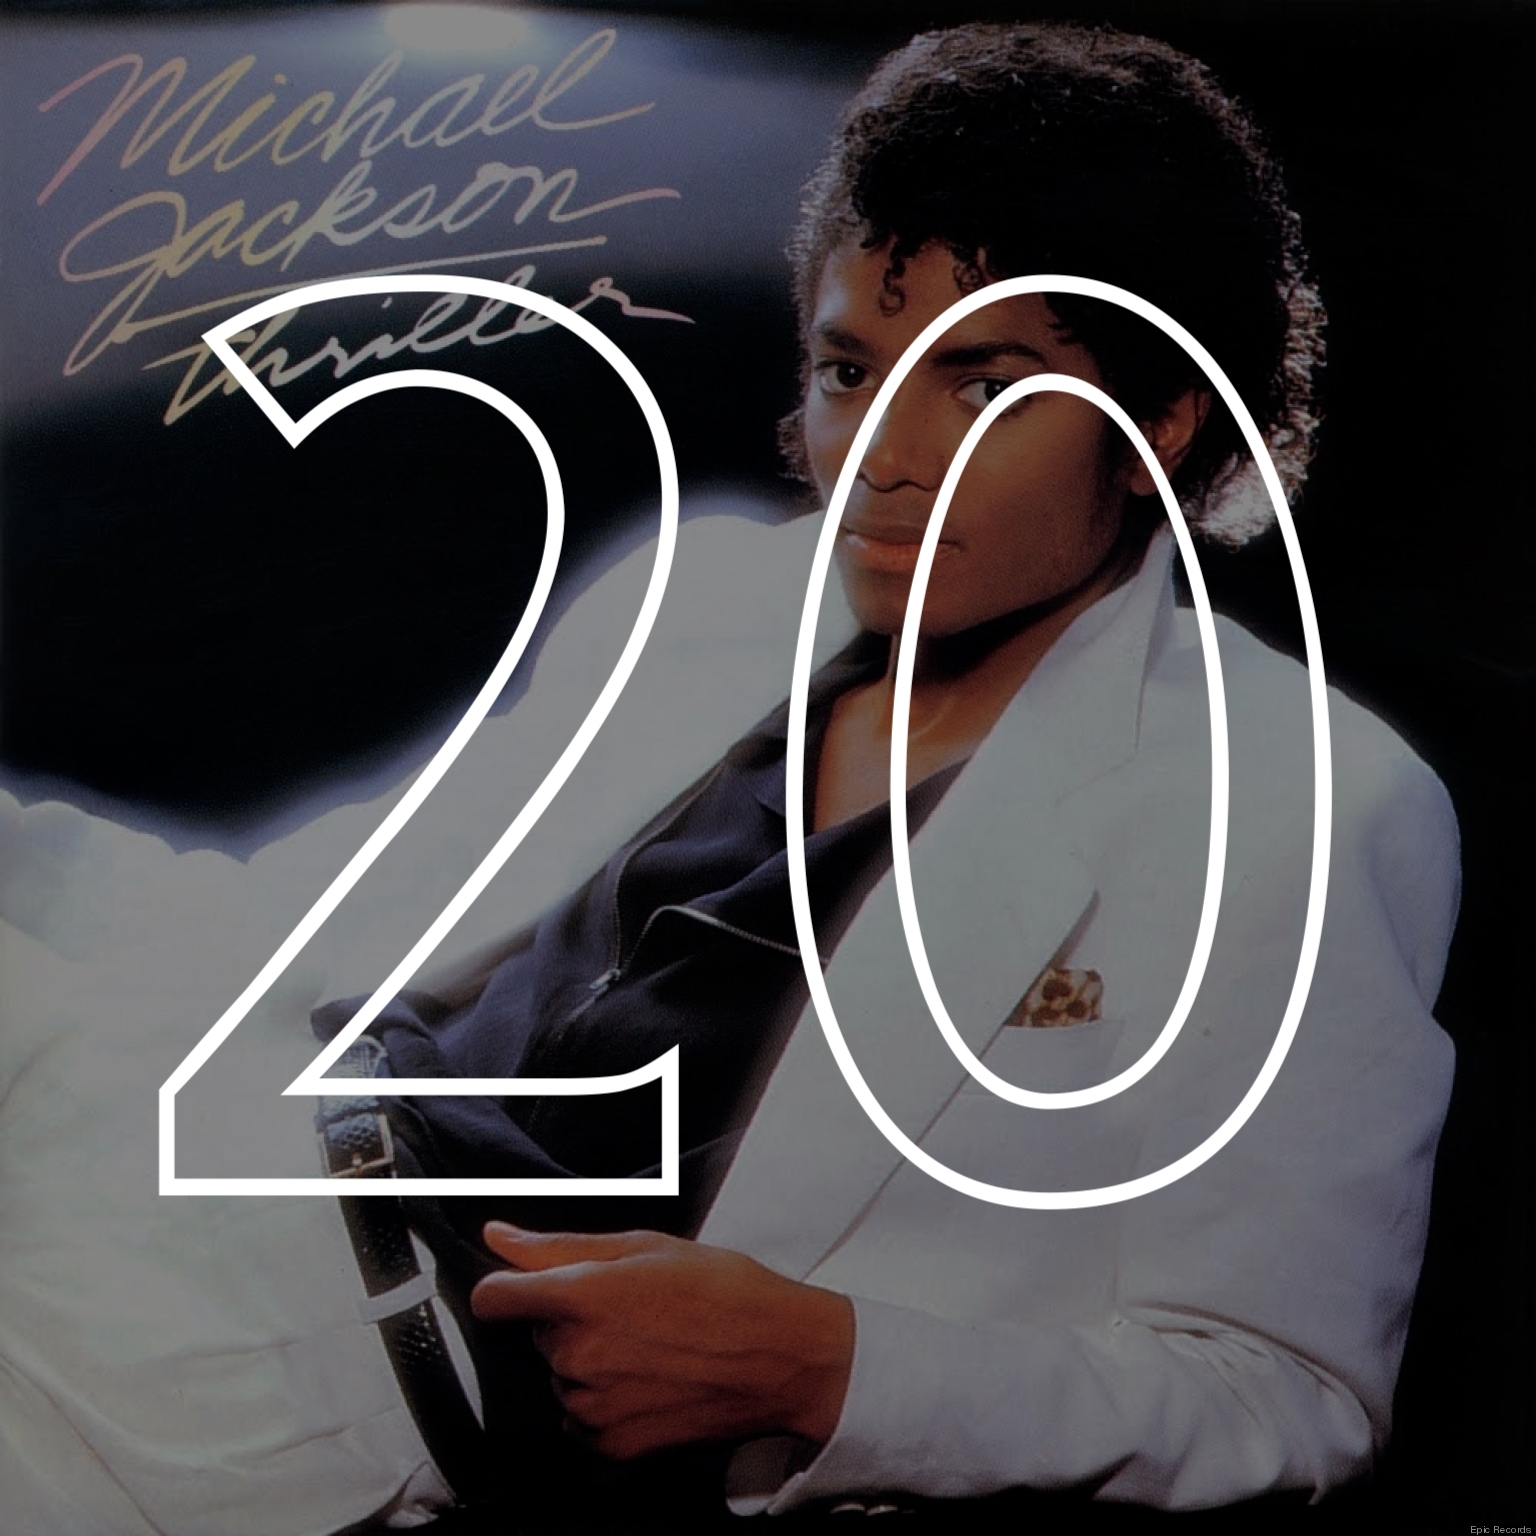 20 Thriller.jpg